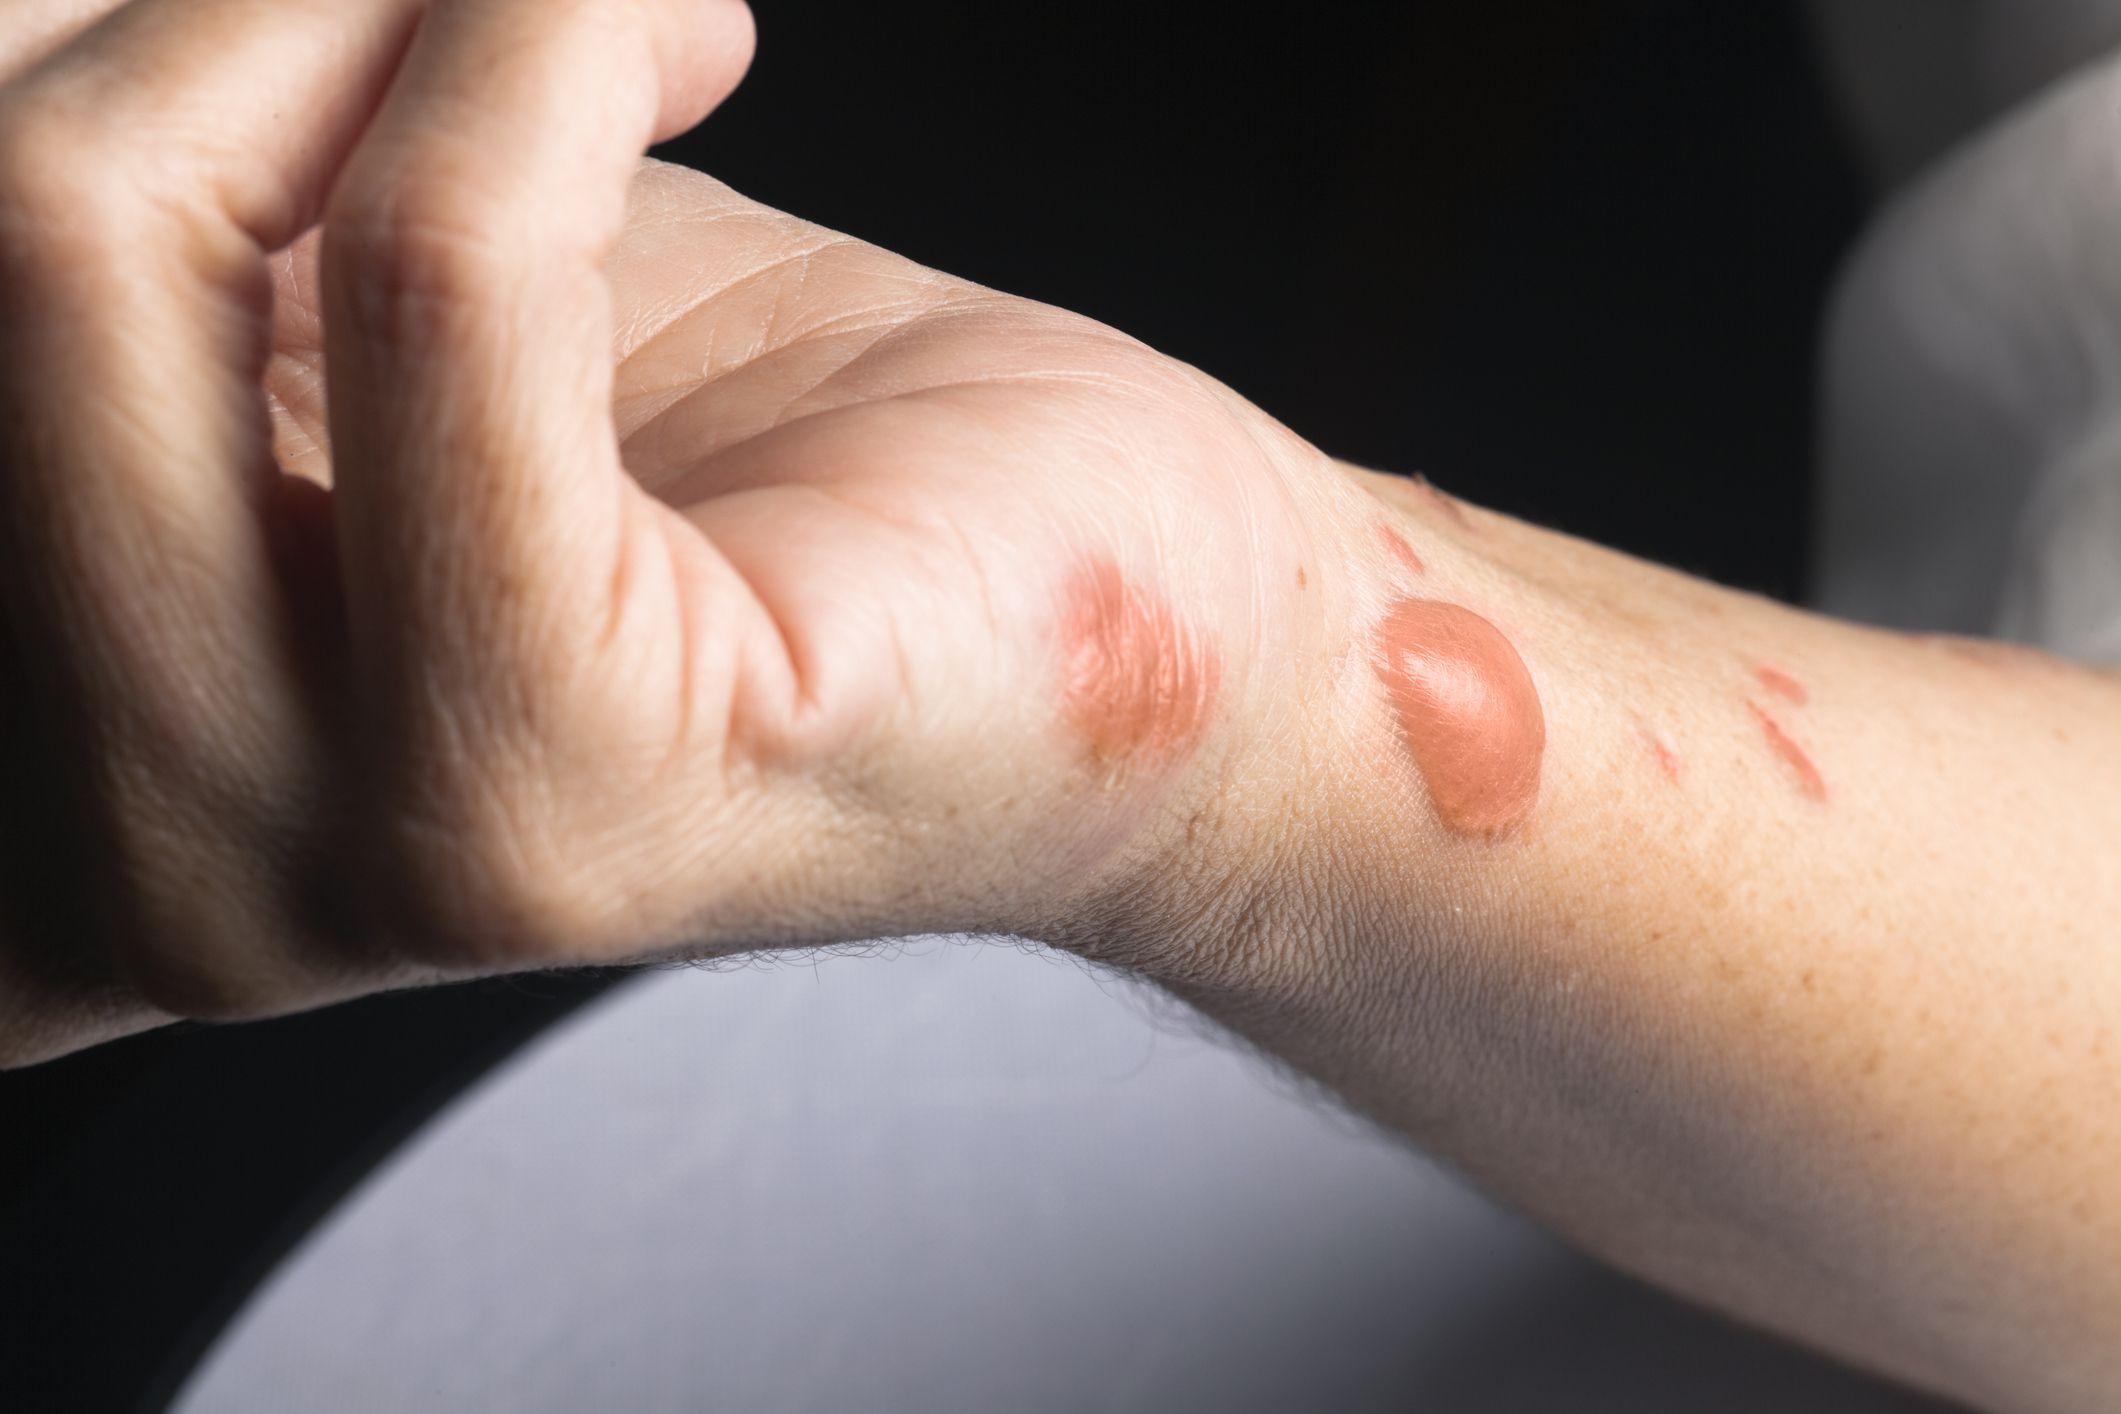 How Burn Scars Are Treated